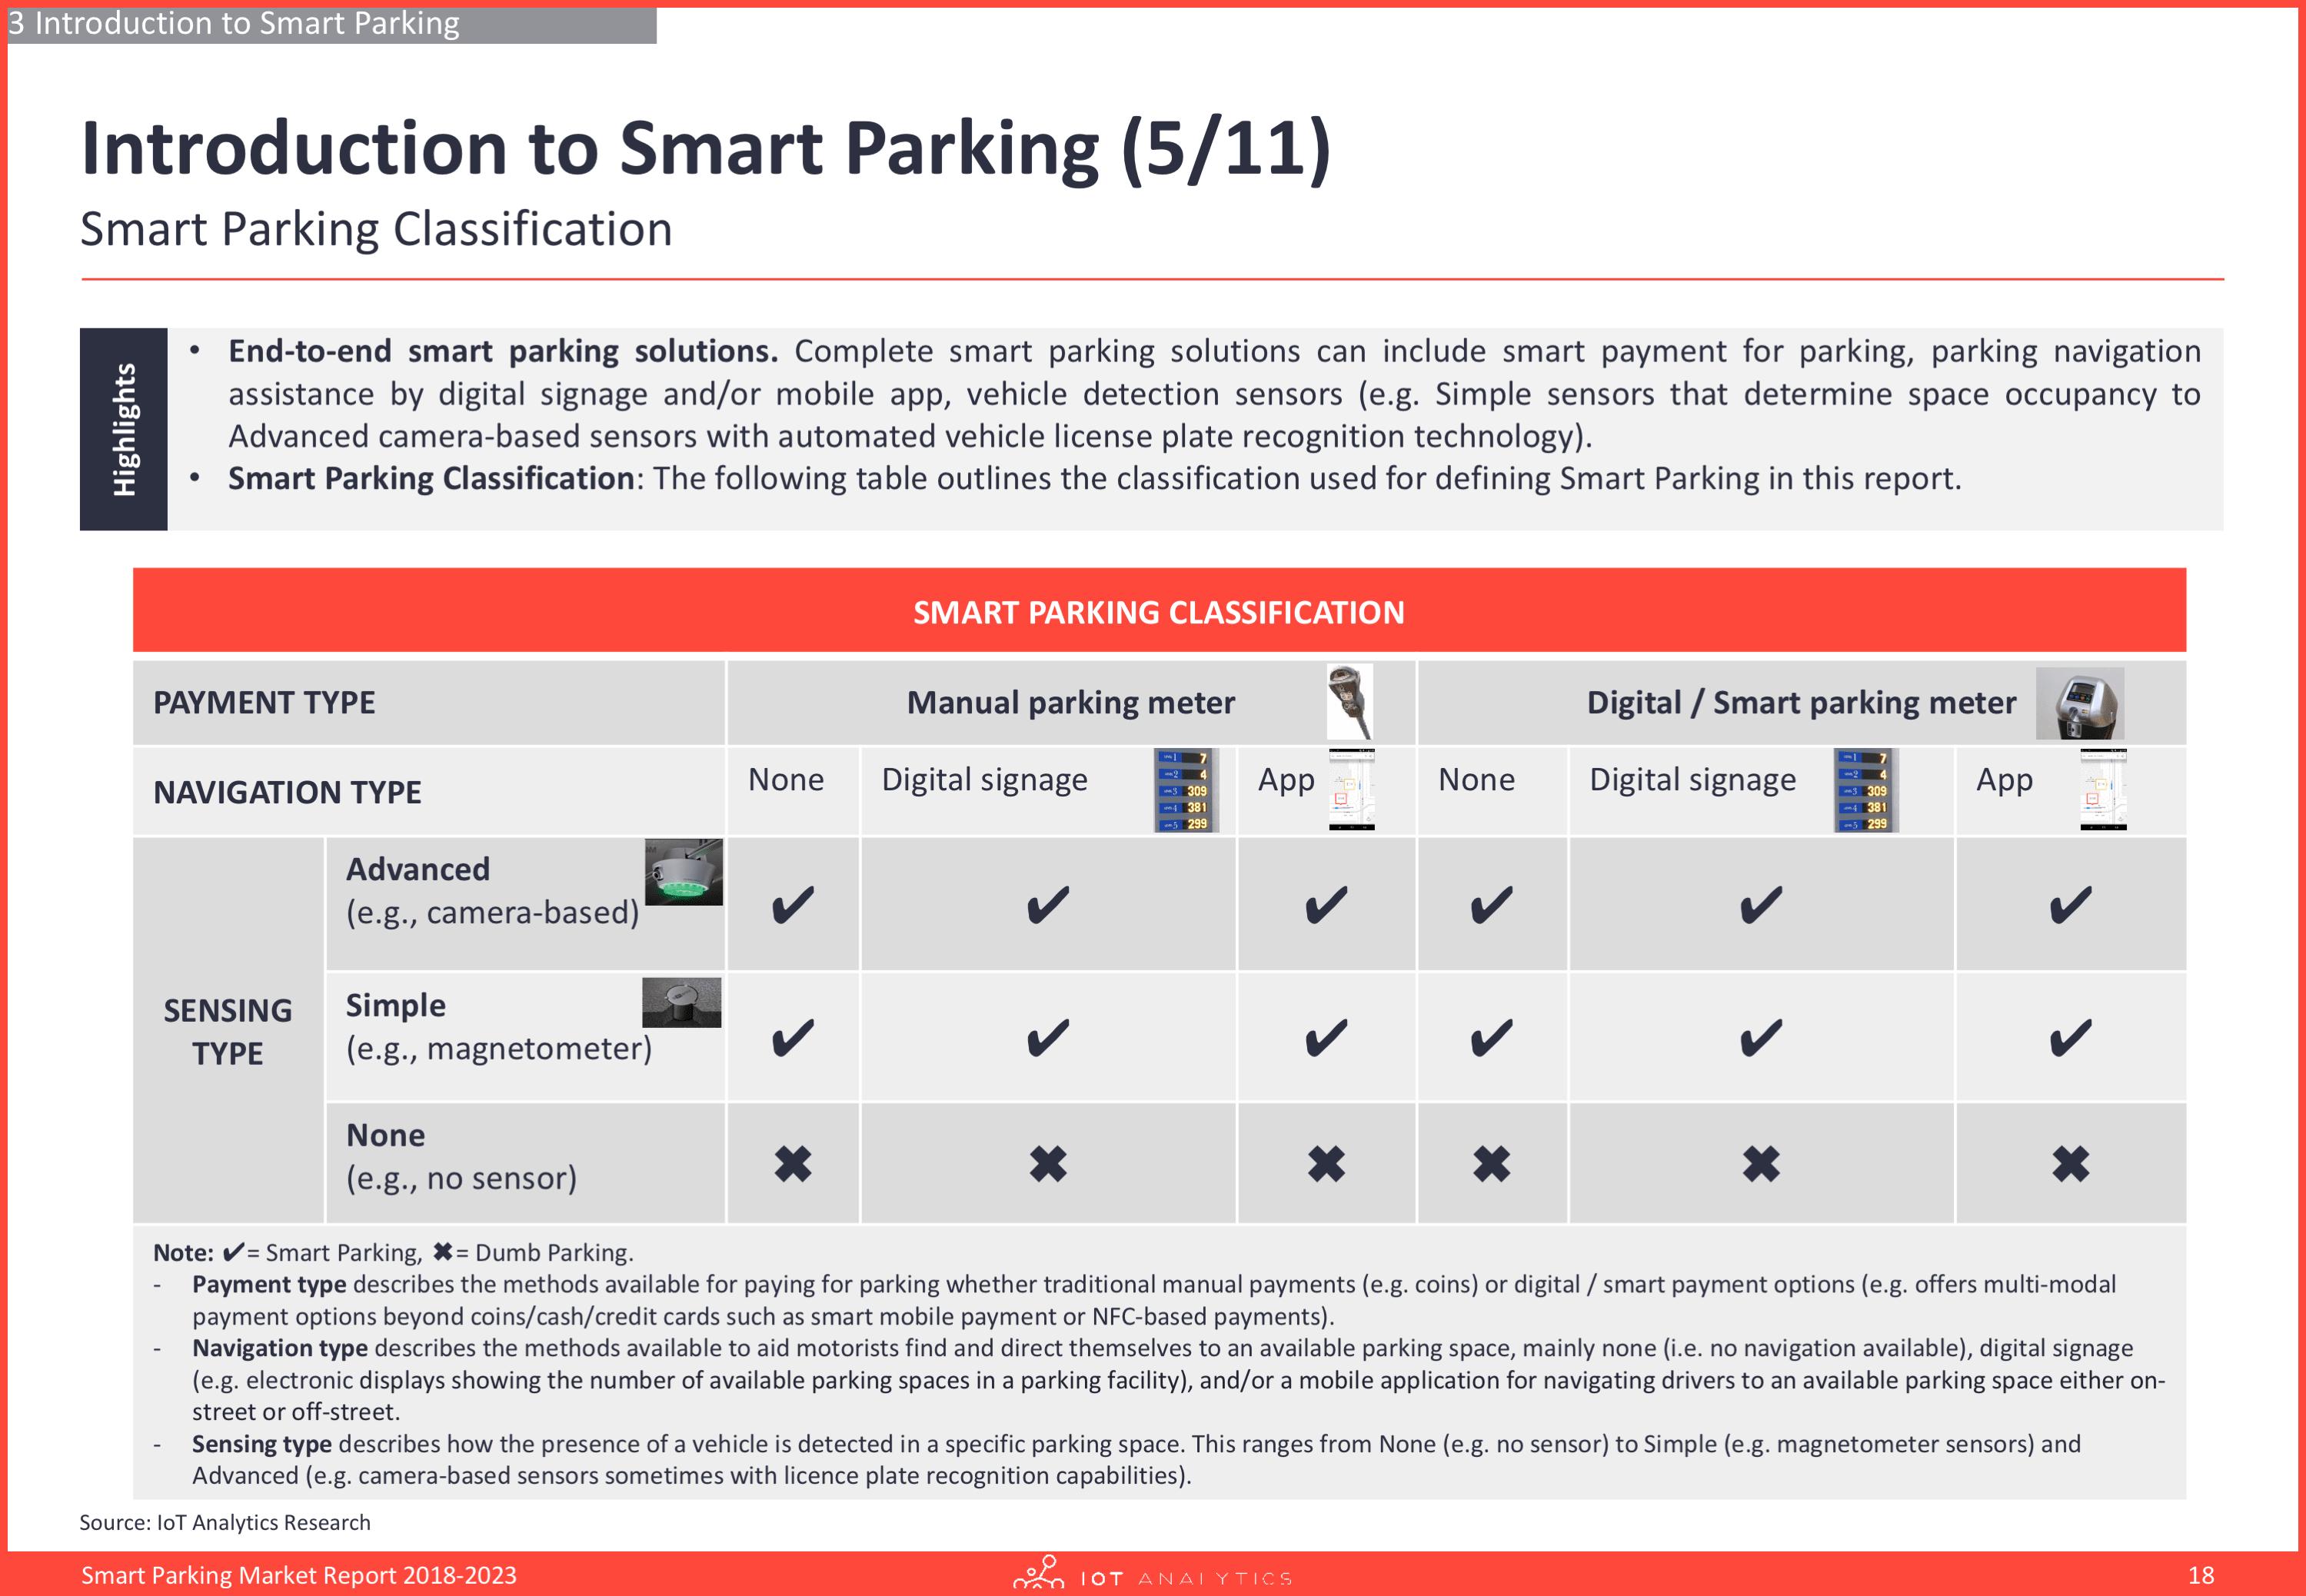 Smart parking market report - Introduction to smart parking